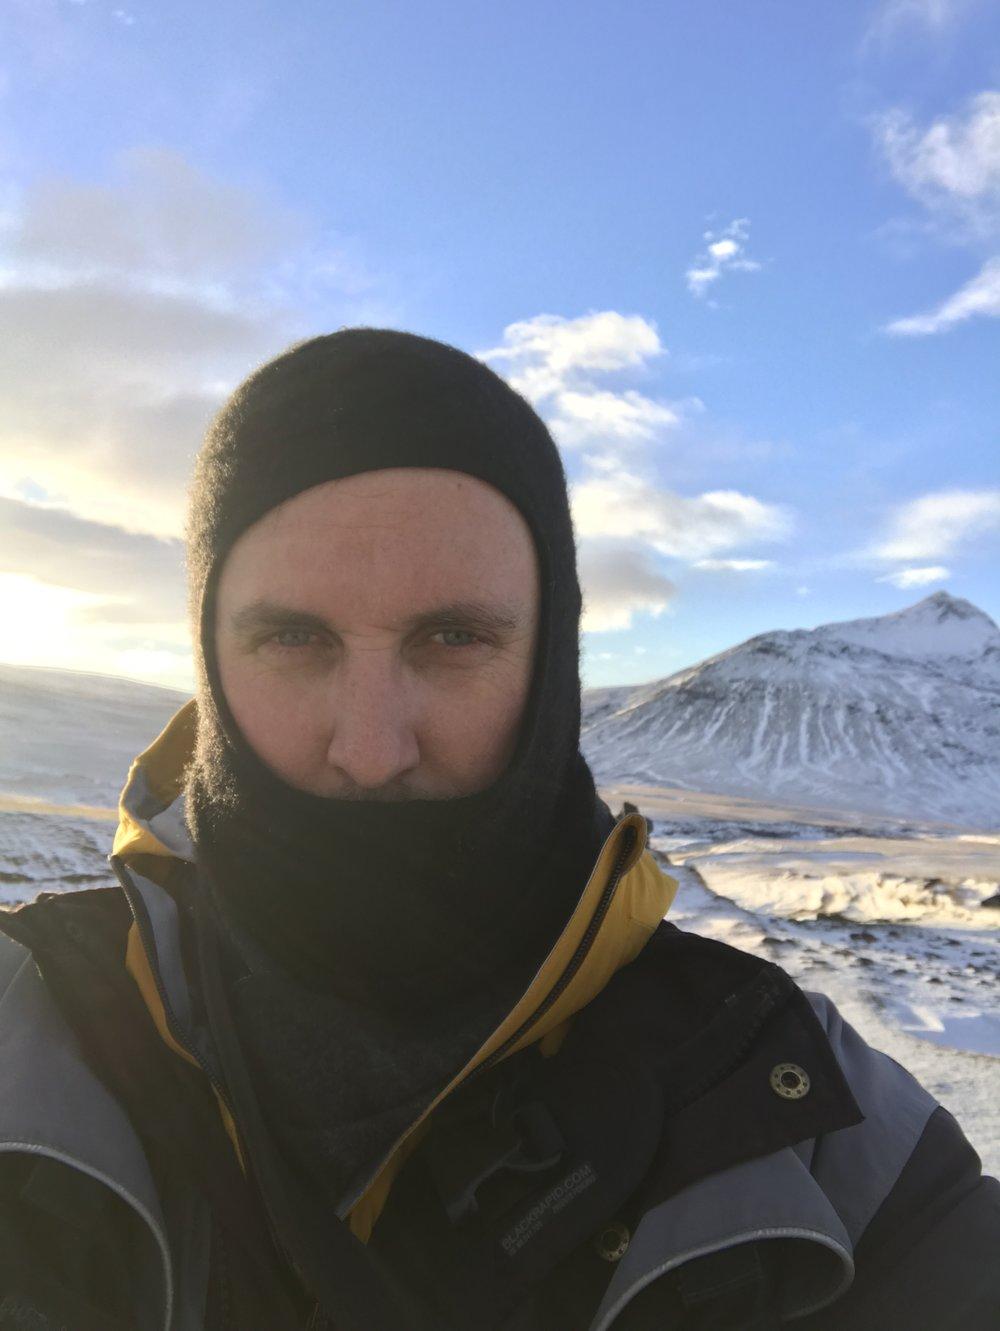 Selfie with Þrihyrningr